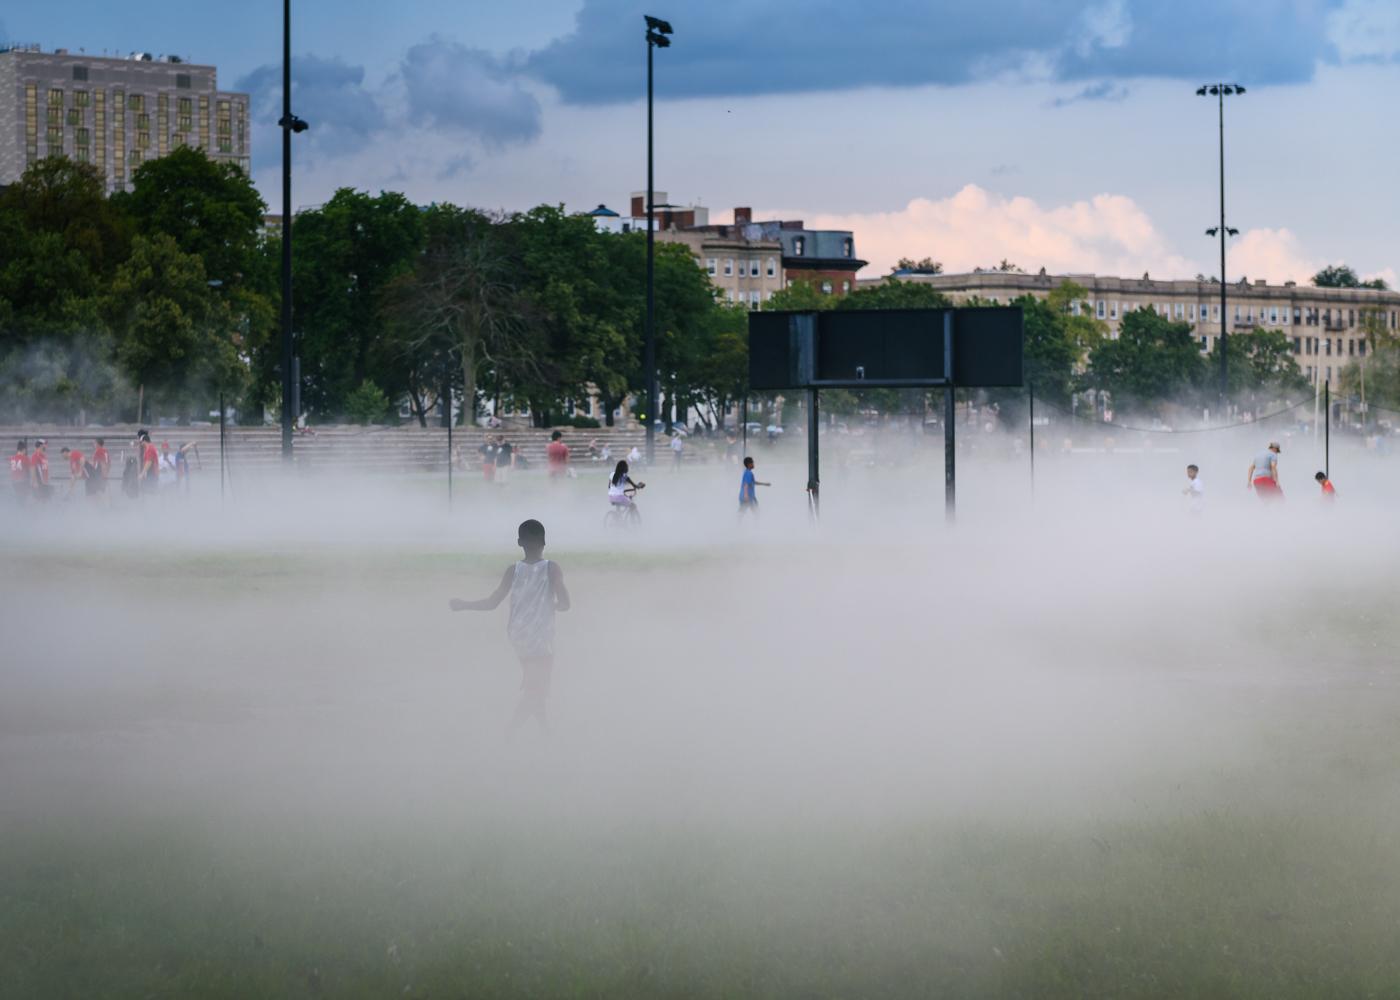 Fog x Canopy (#72509_Fens)  fog billows across the adjacent playing fields.